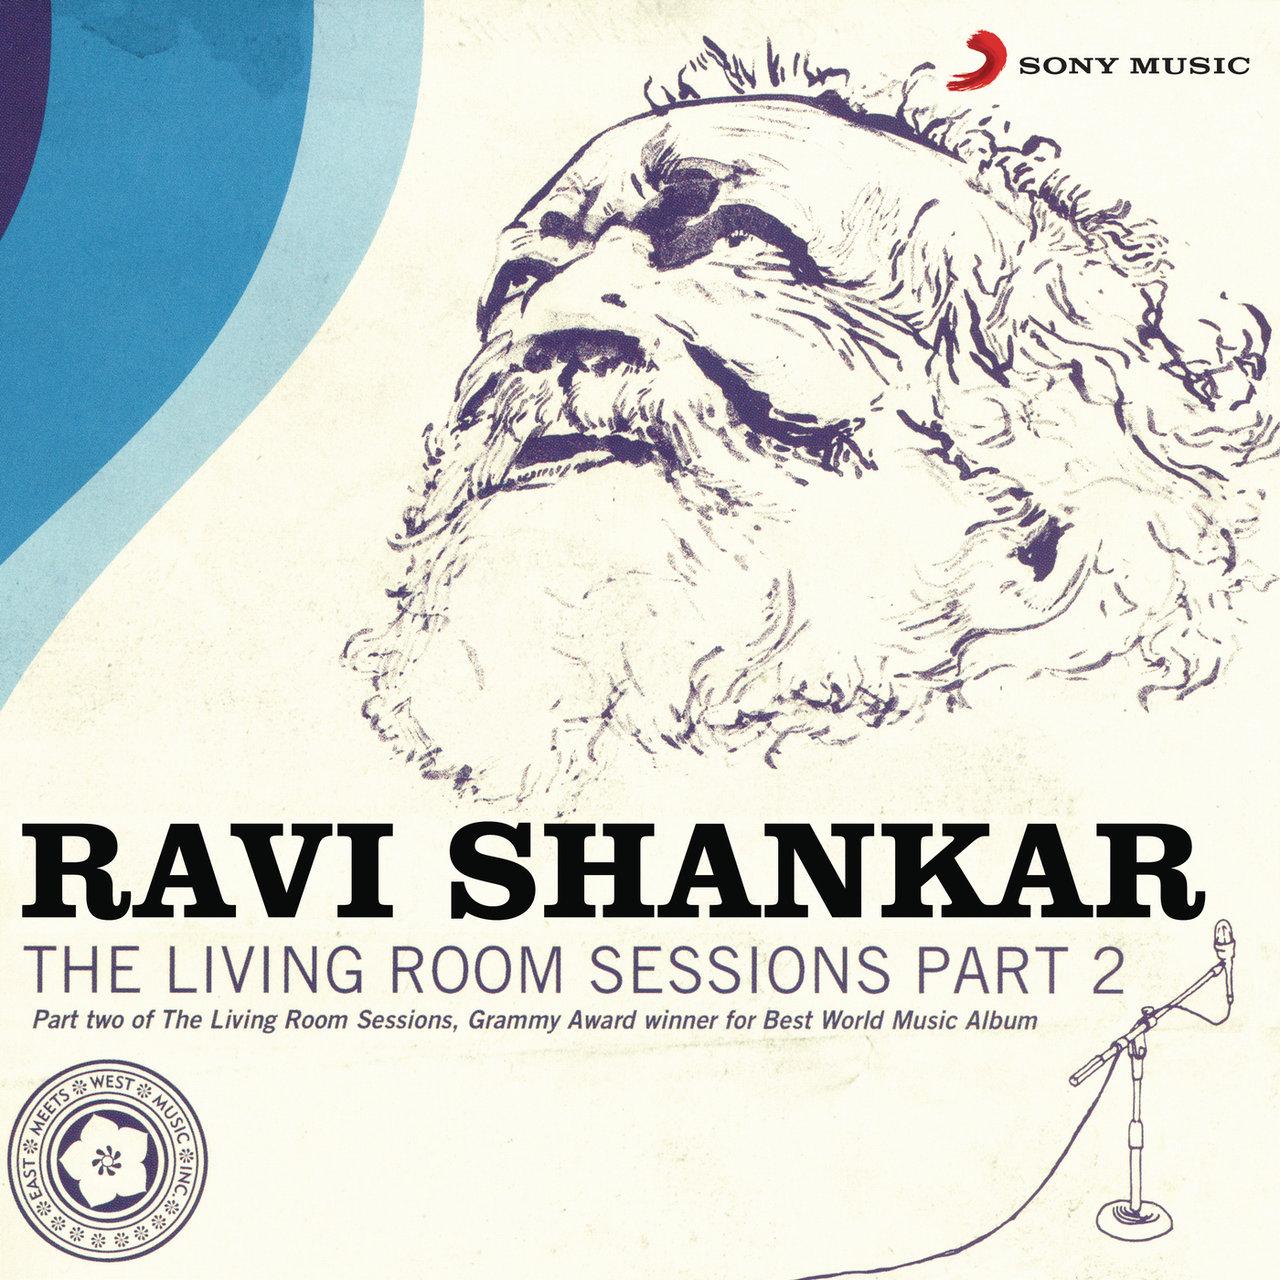 TIDAL: Listen to The Living Room Sessions, Pt. 1 on TIDAL